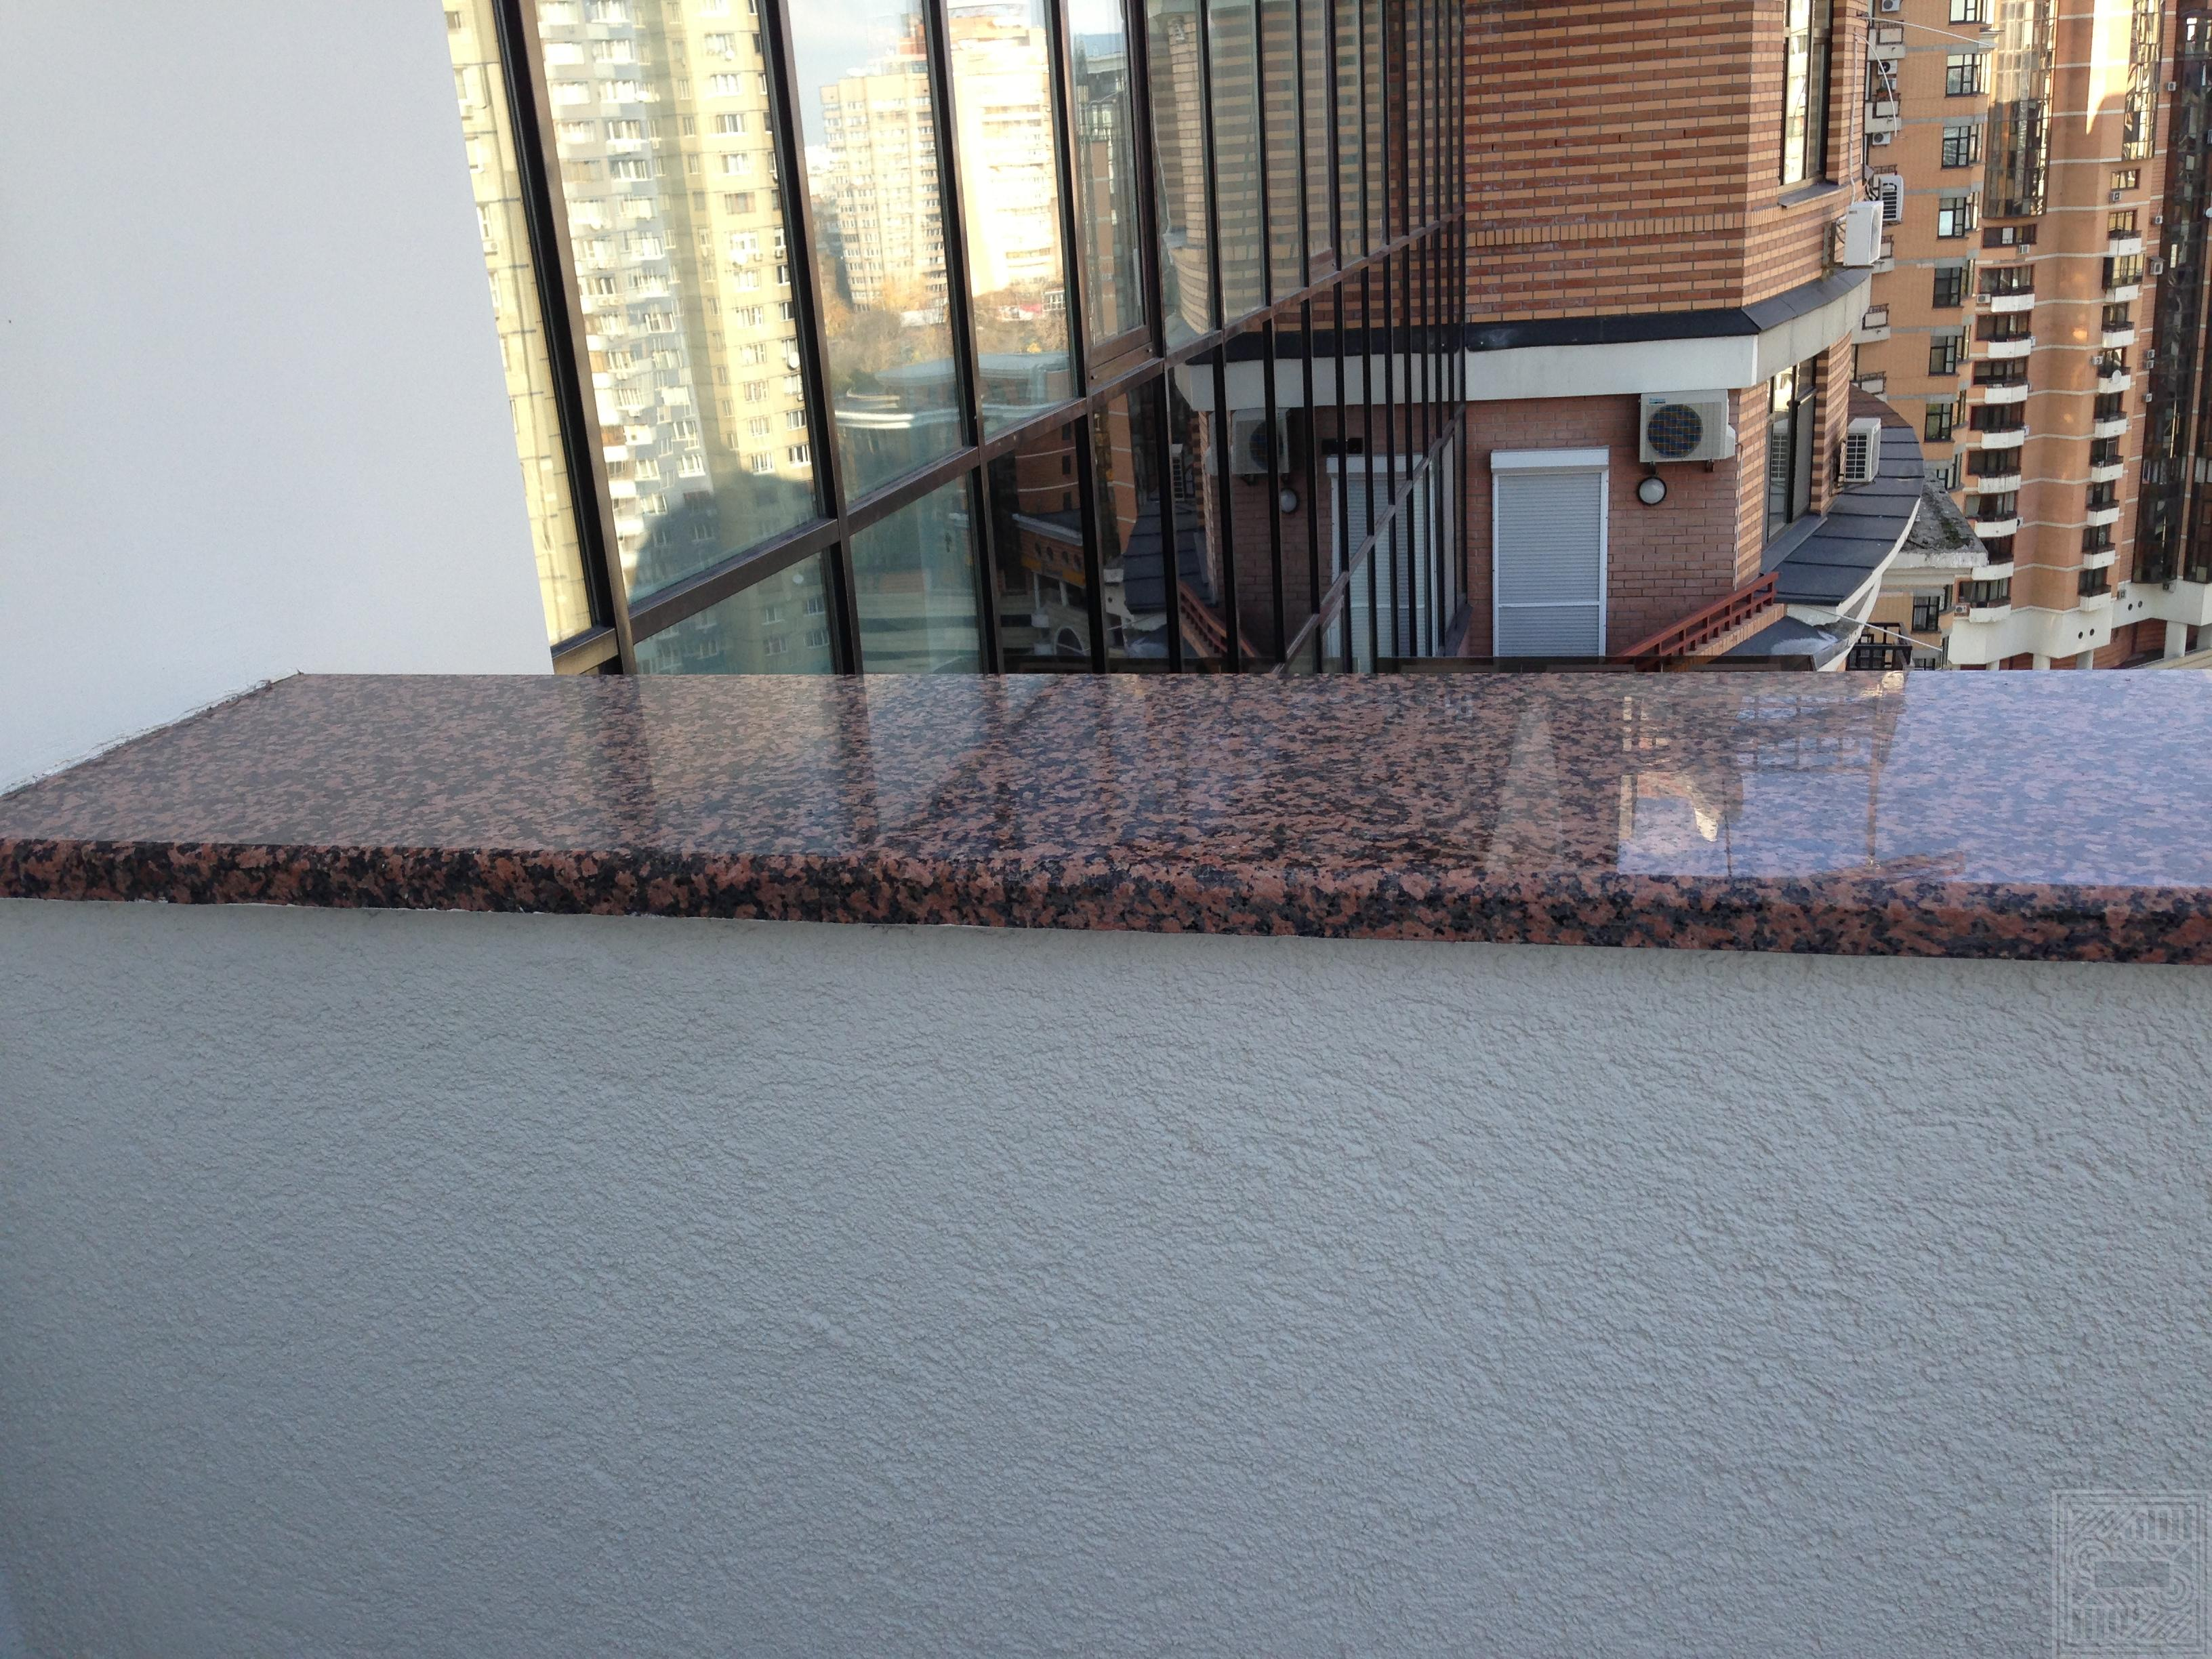 Подоконник  из гранита Rosa Balmoral 30 мм windowsill-granite - Nakryvnaya plita iz granita Rosa Balmoral 30 mm